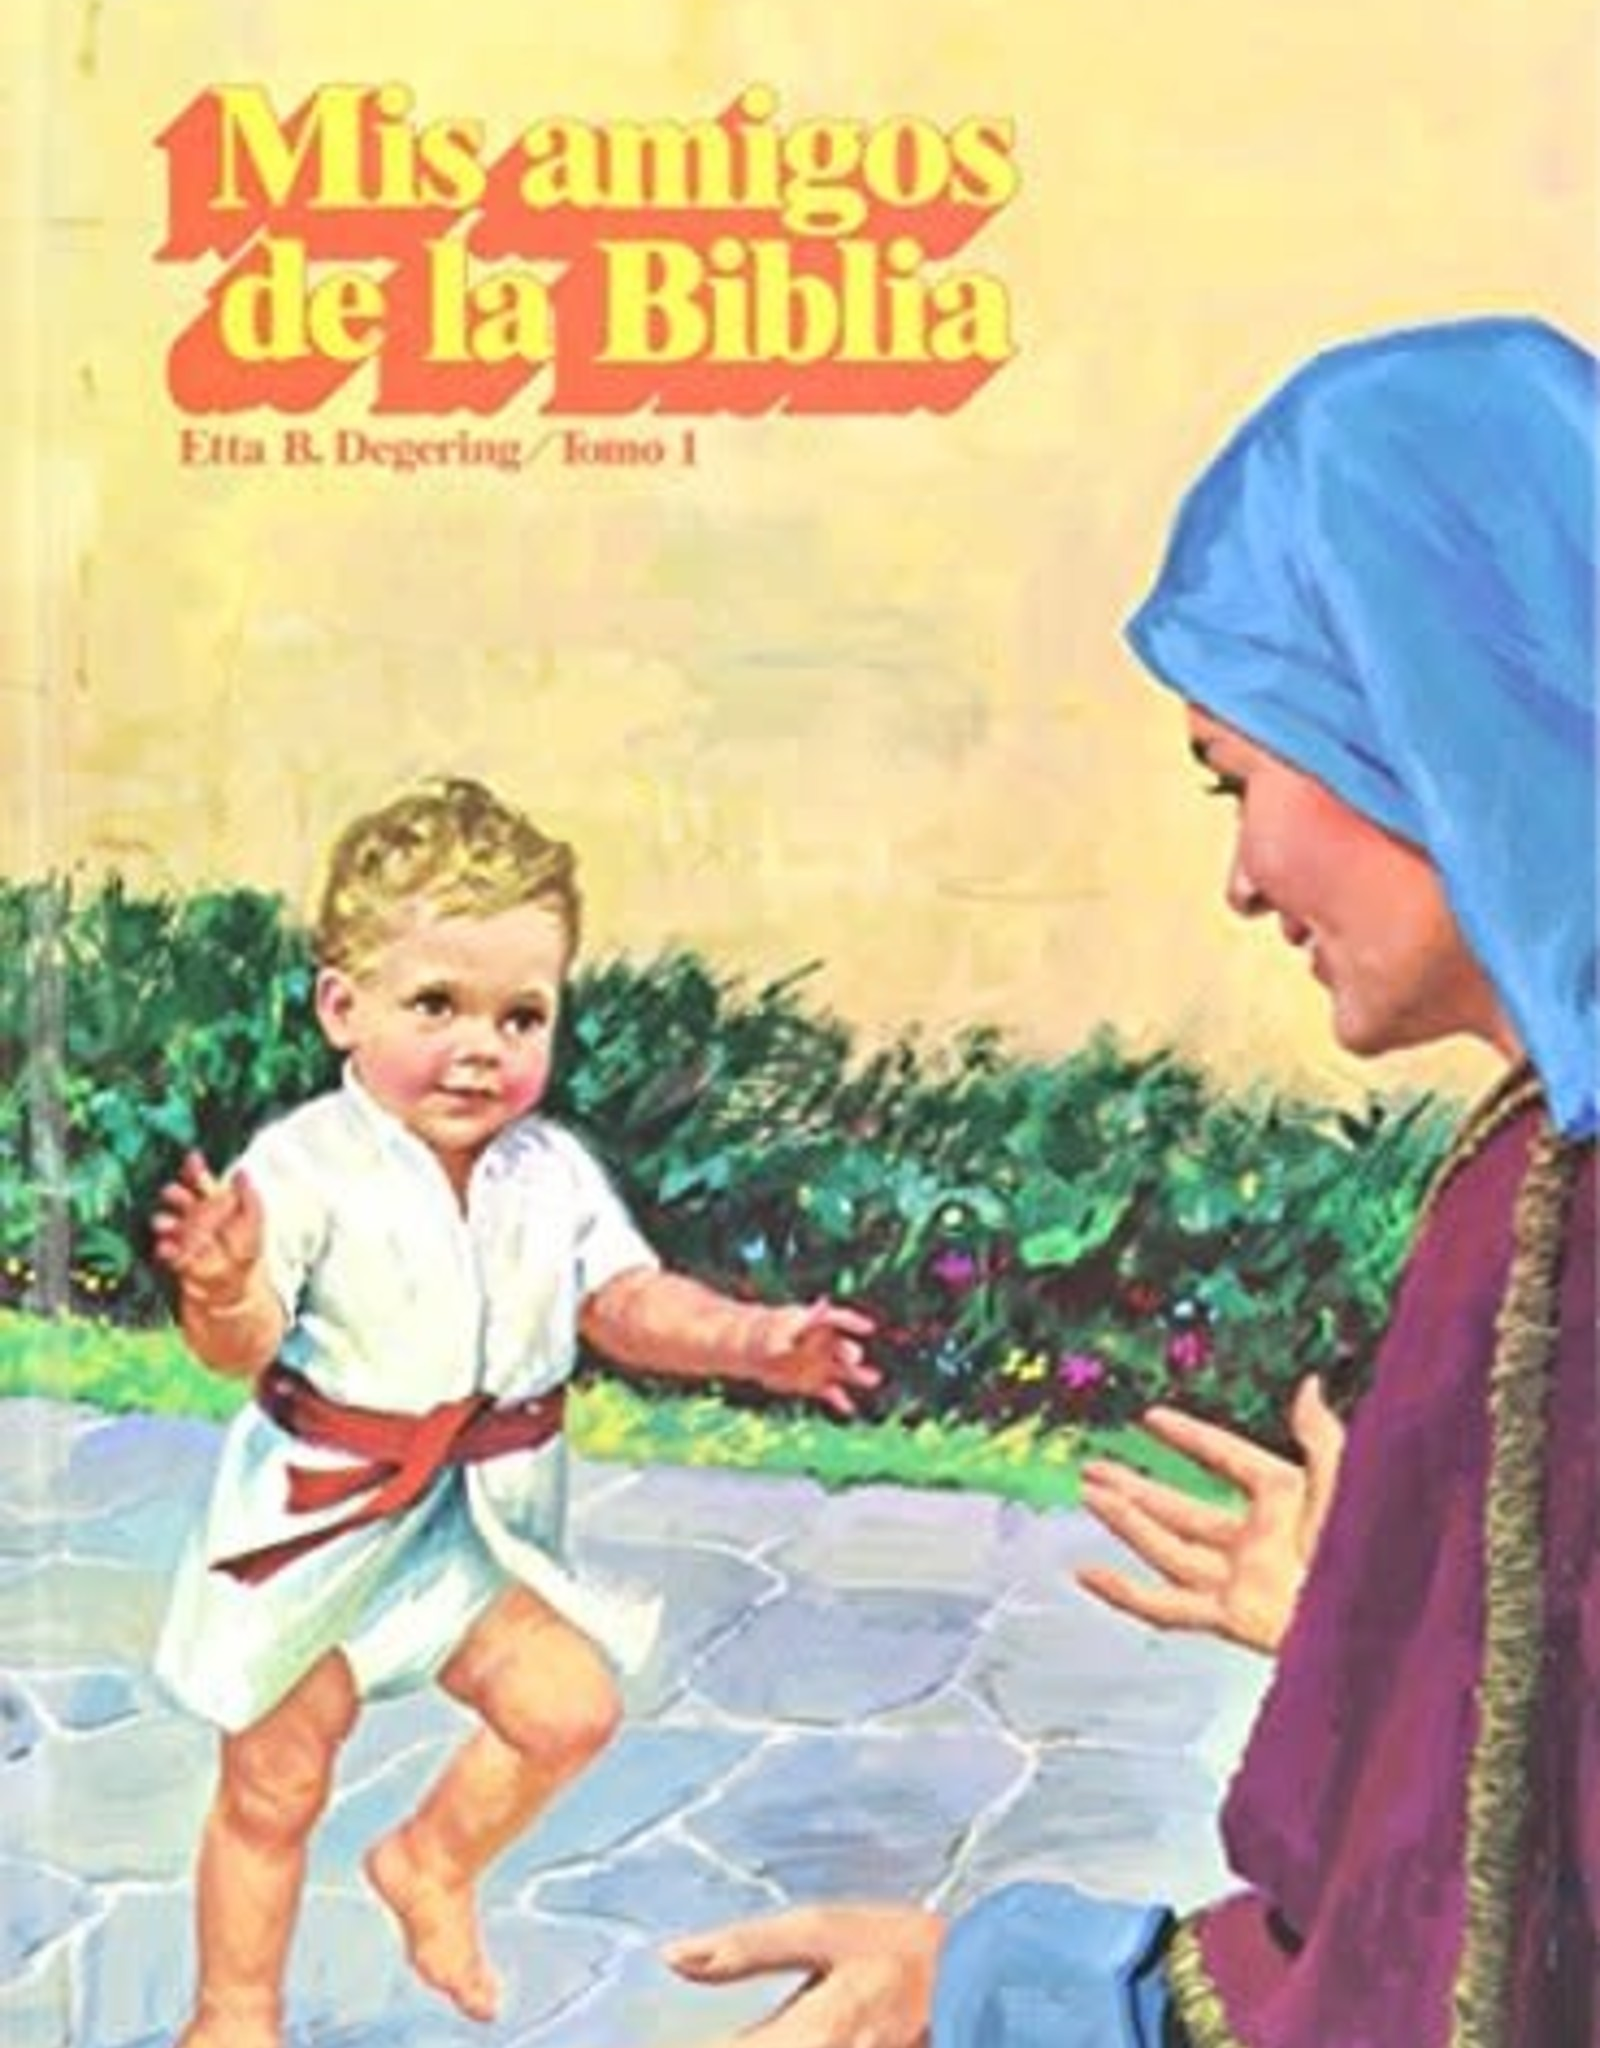 Etta B. Degerring Mis amigos de la Biblia (set of 5)